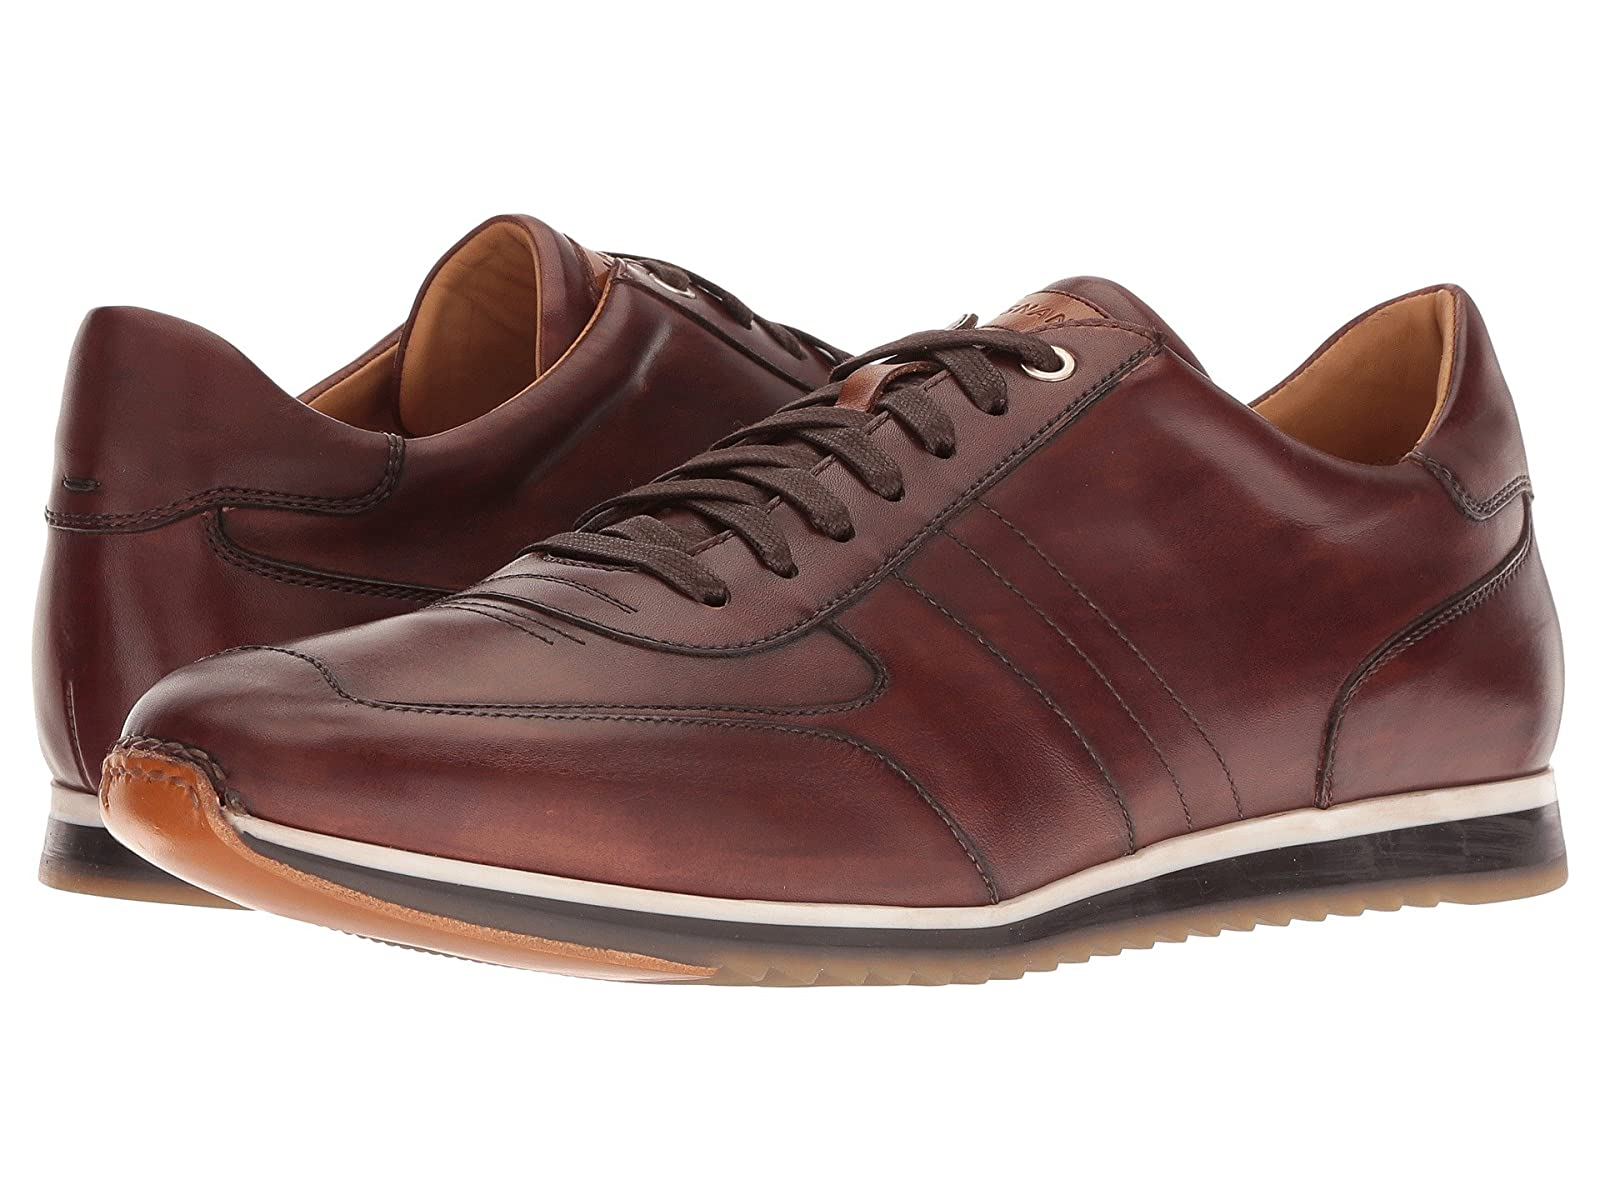 Magnanni RicoAtmospheric grades have affordable shoes